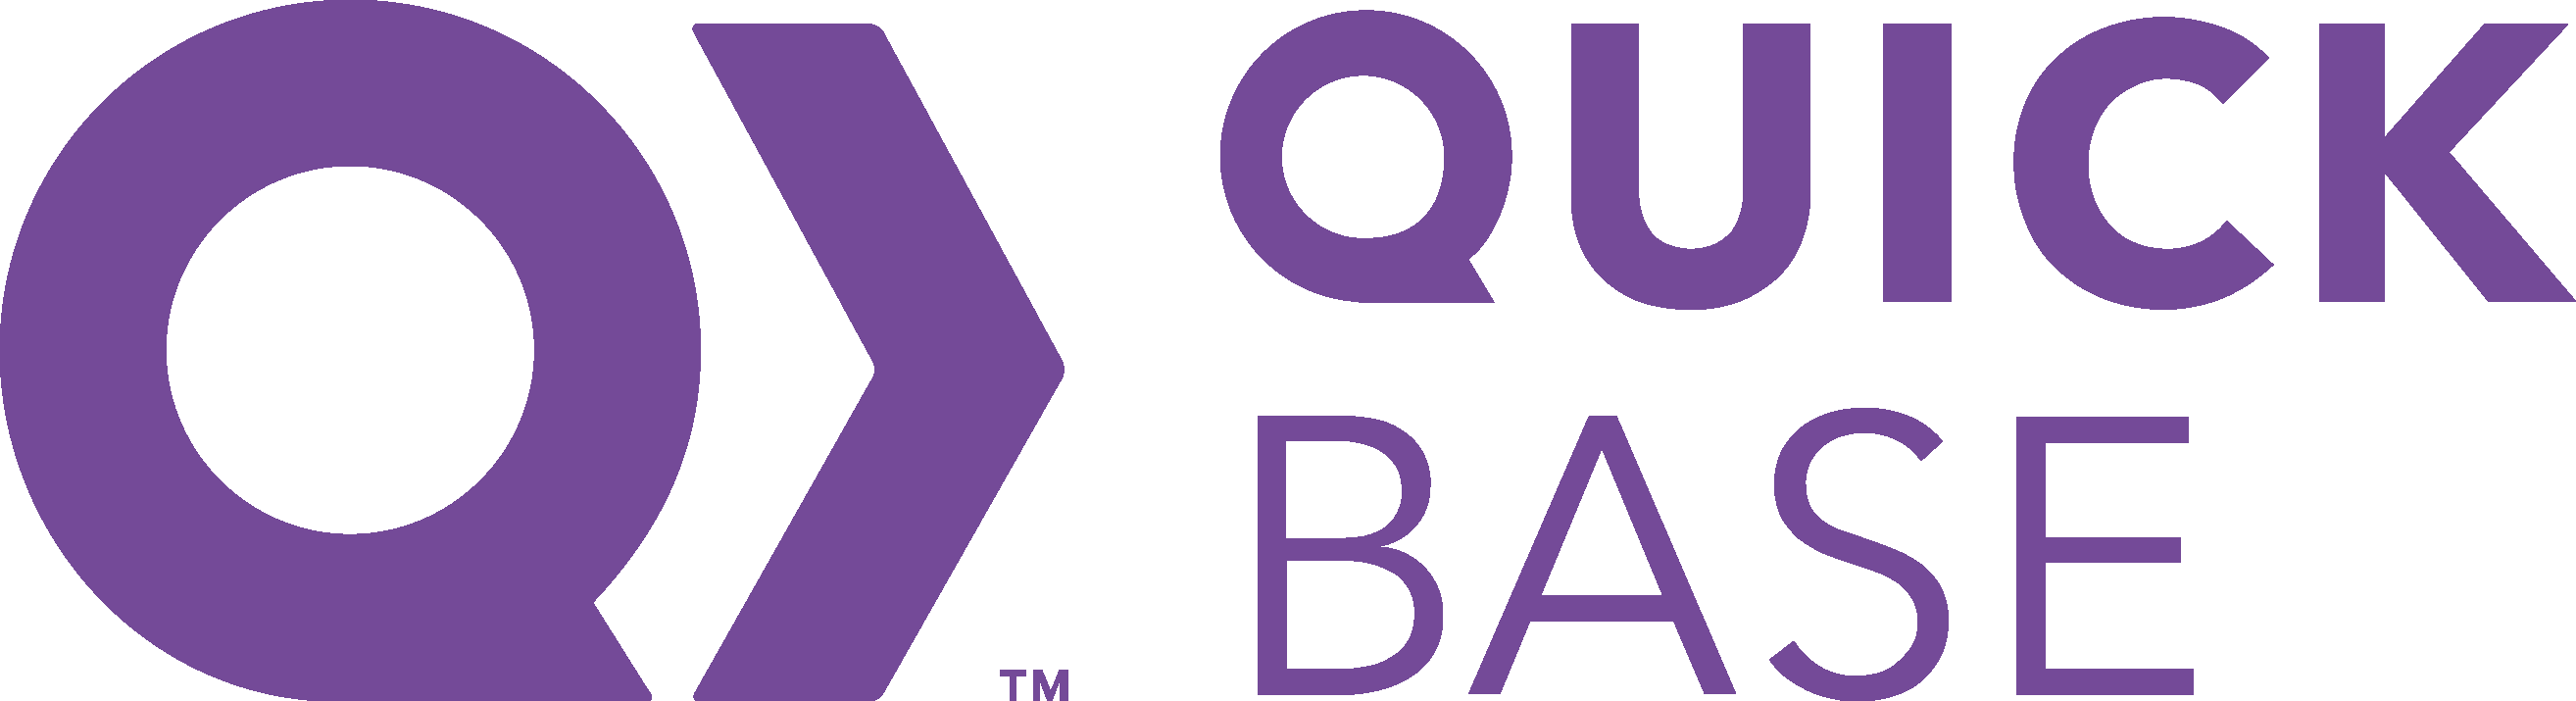 Quick Base Logo png